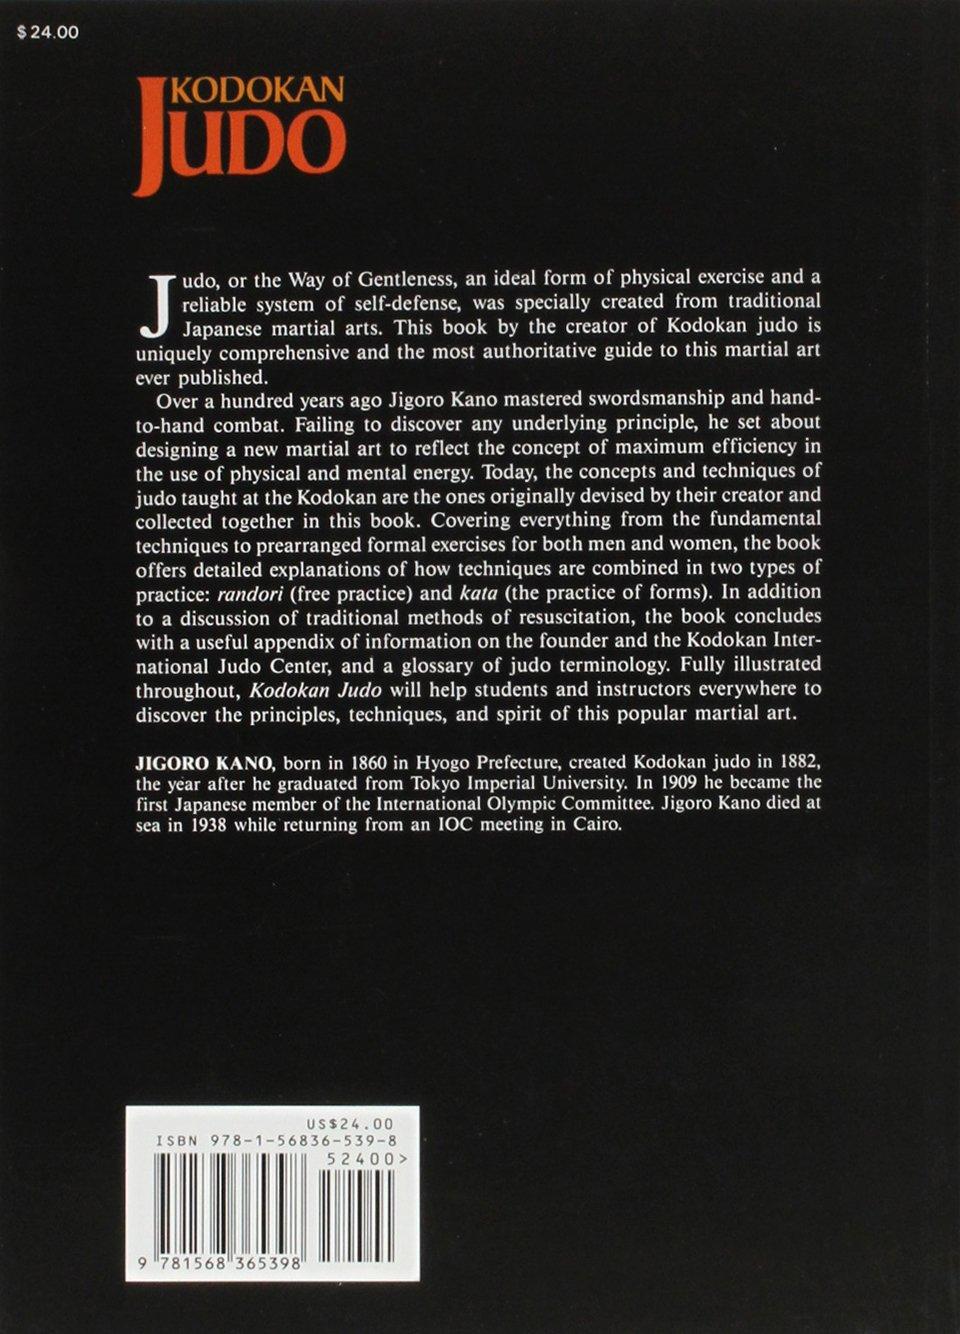 Jigoro Kano Book